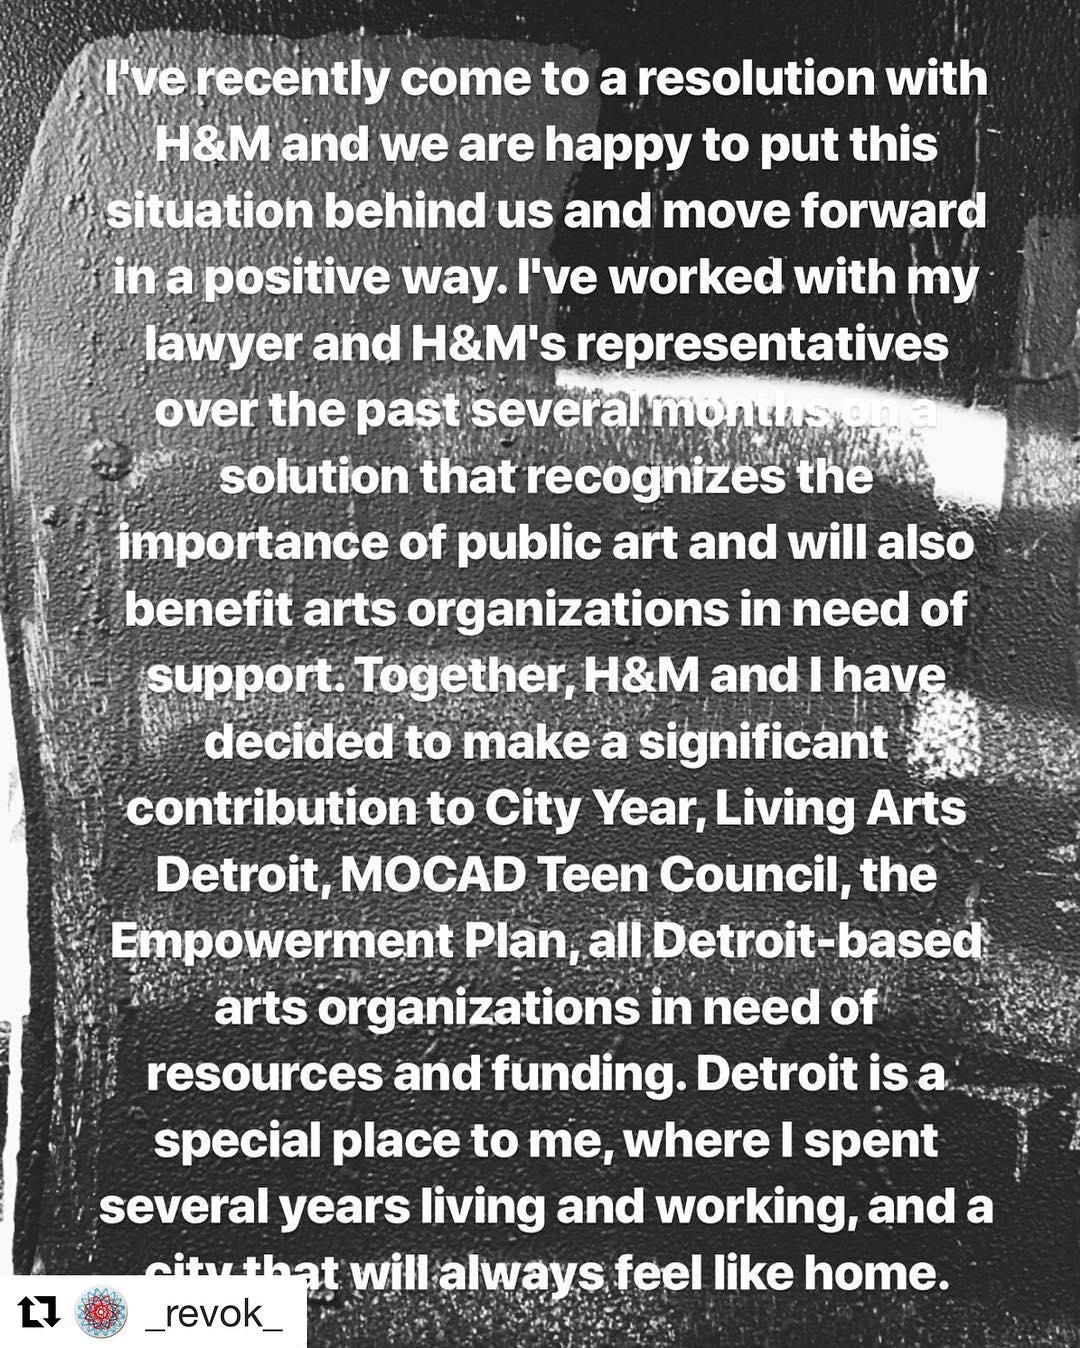 Statement from Revok's Instagram page.